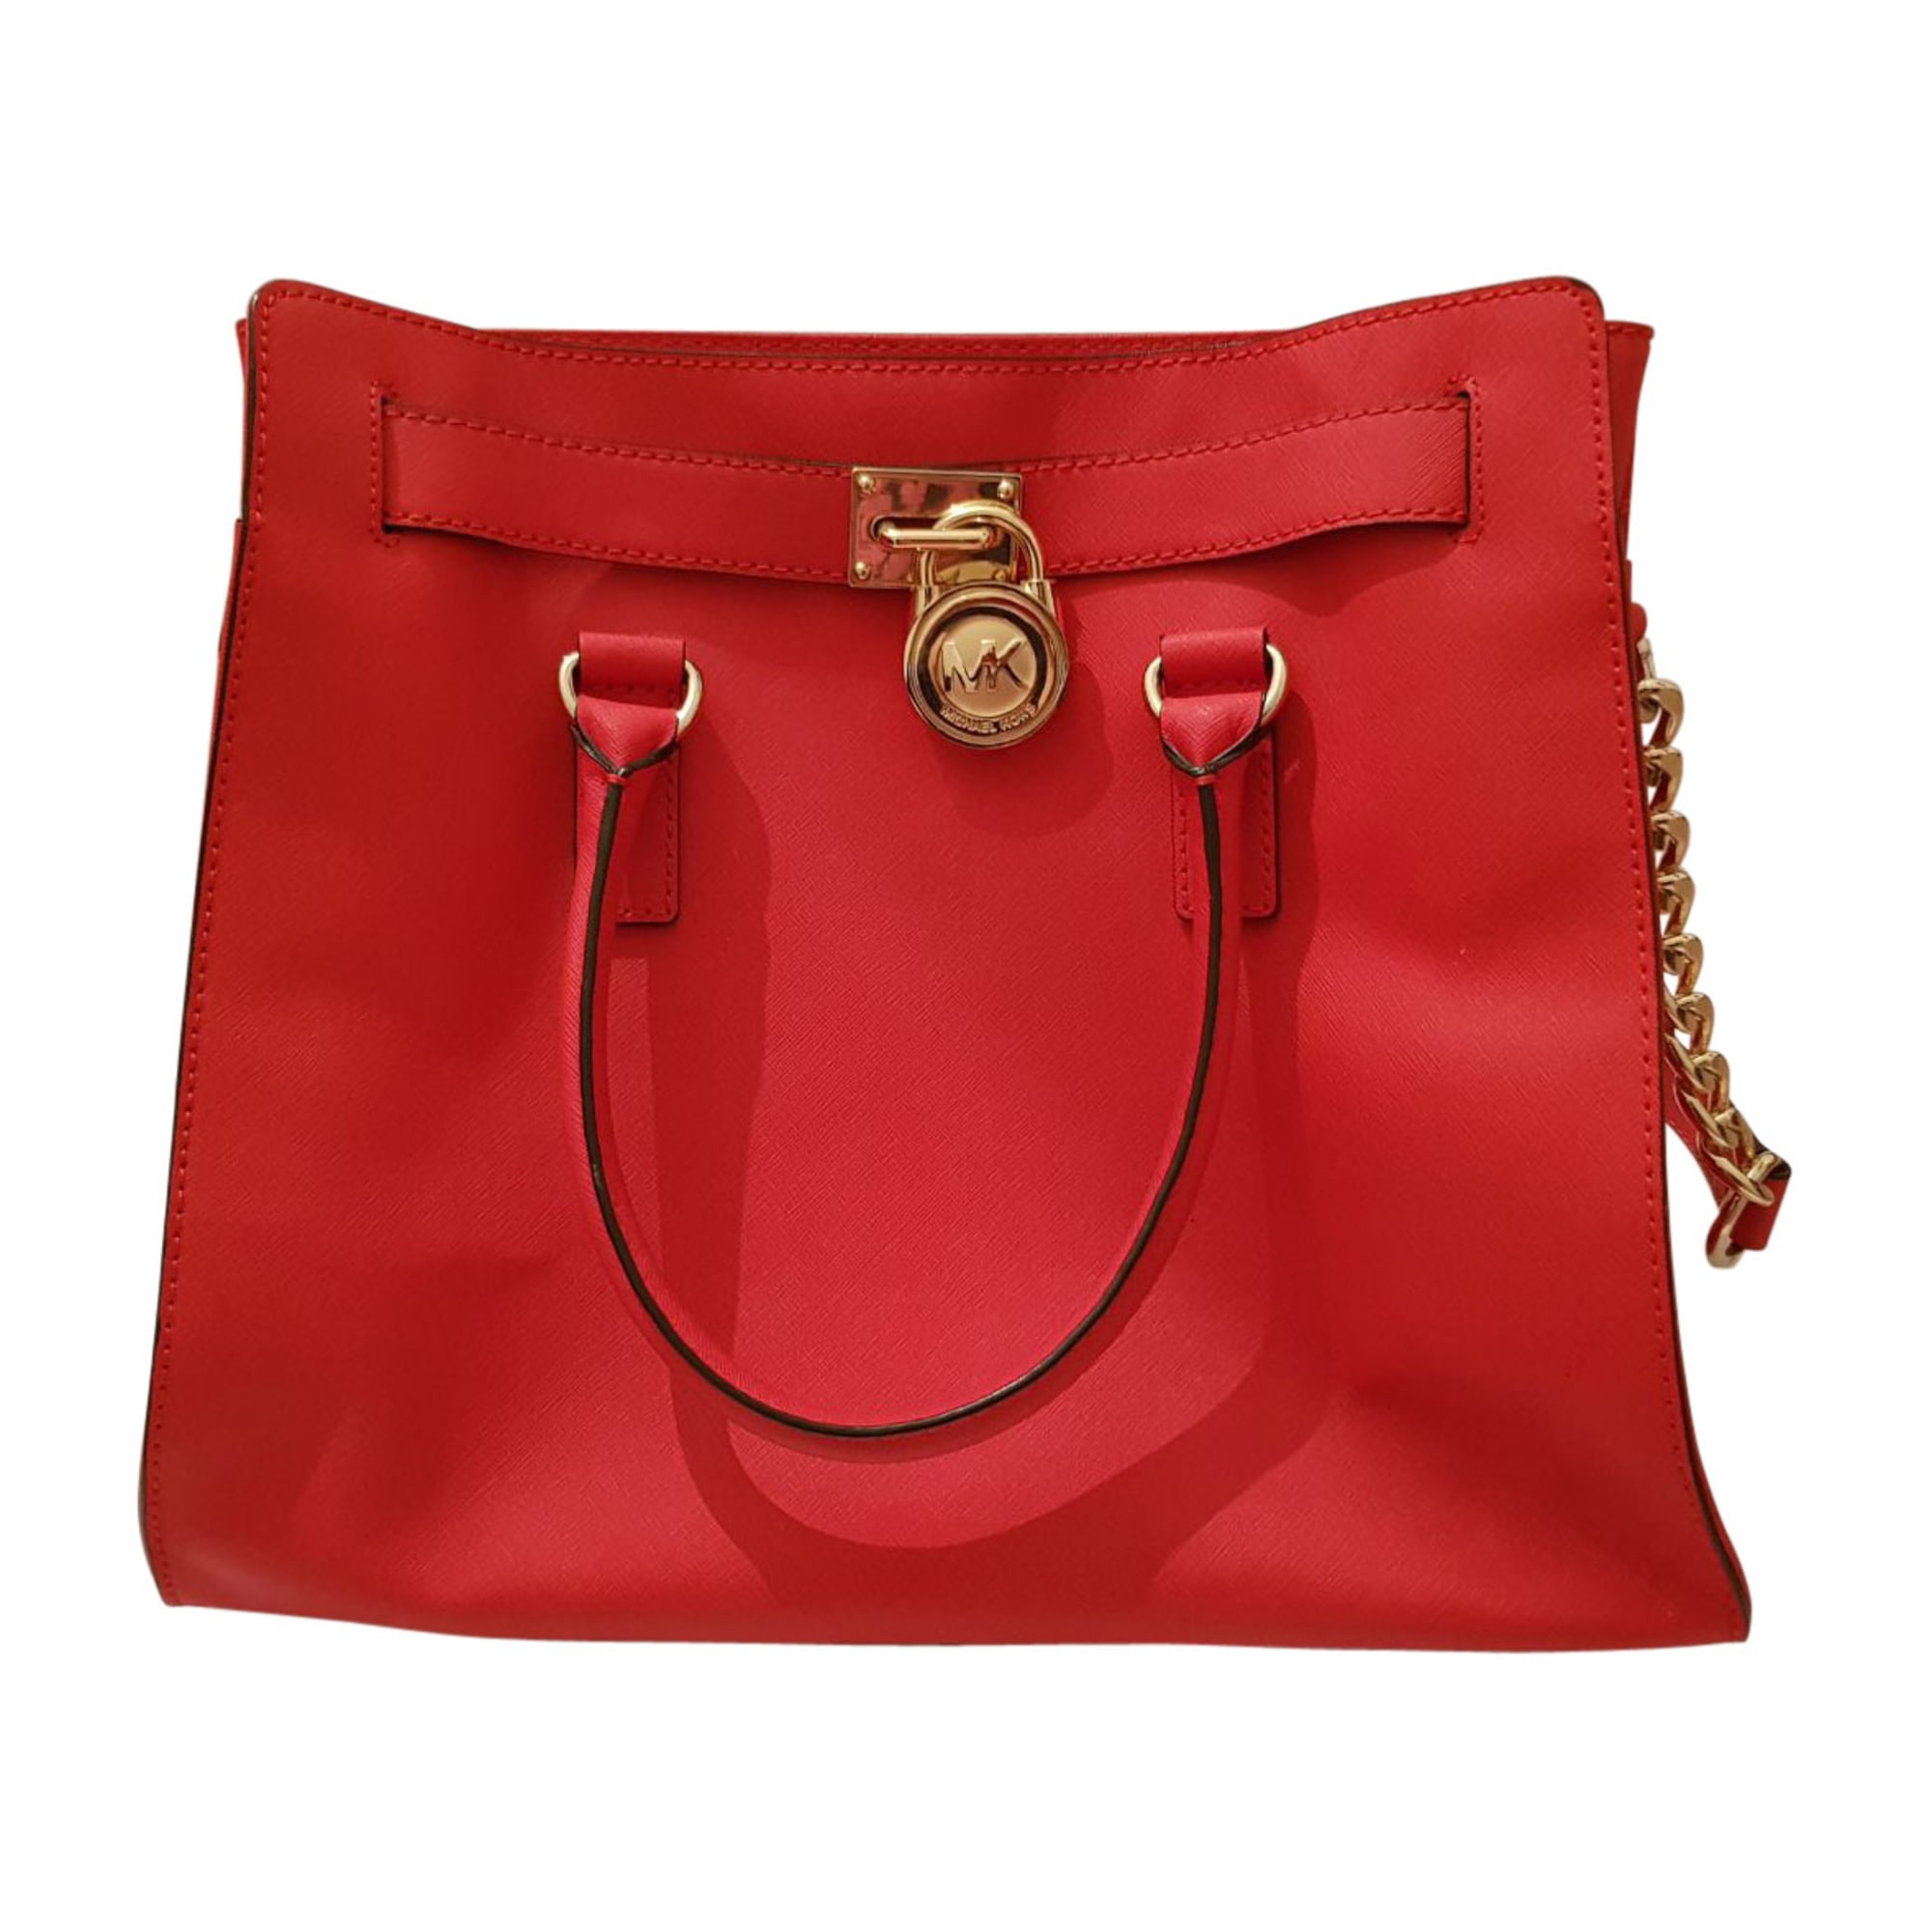 Leather Handbag MICHAEL KORS Red, burgundy